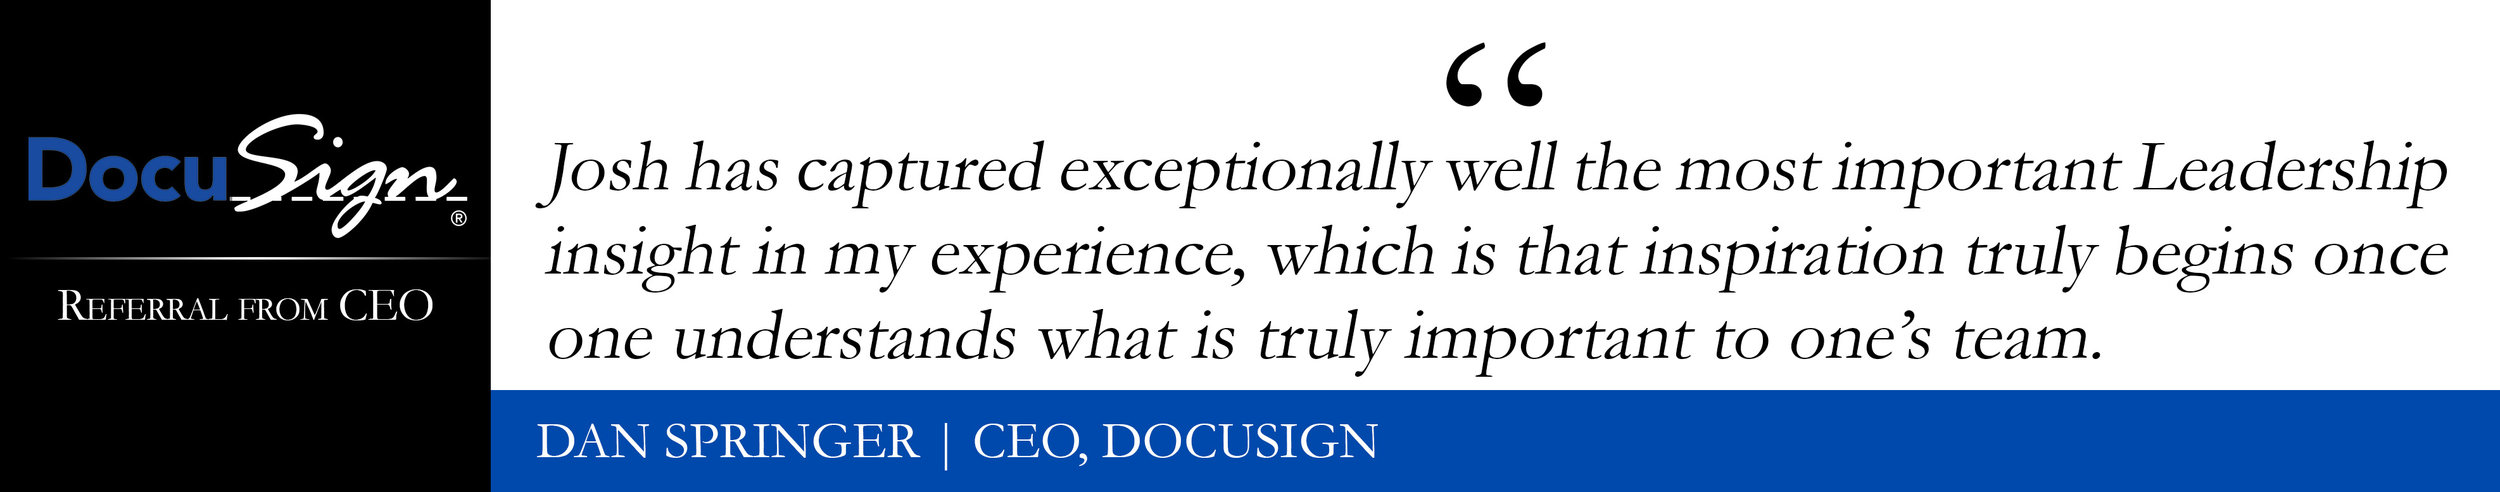 Leadership Redefined Quote 4.jpg